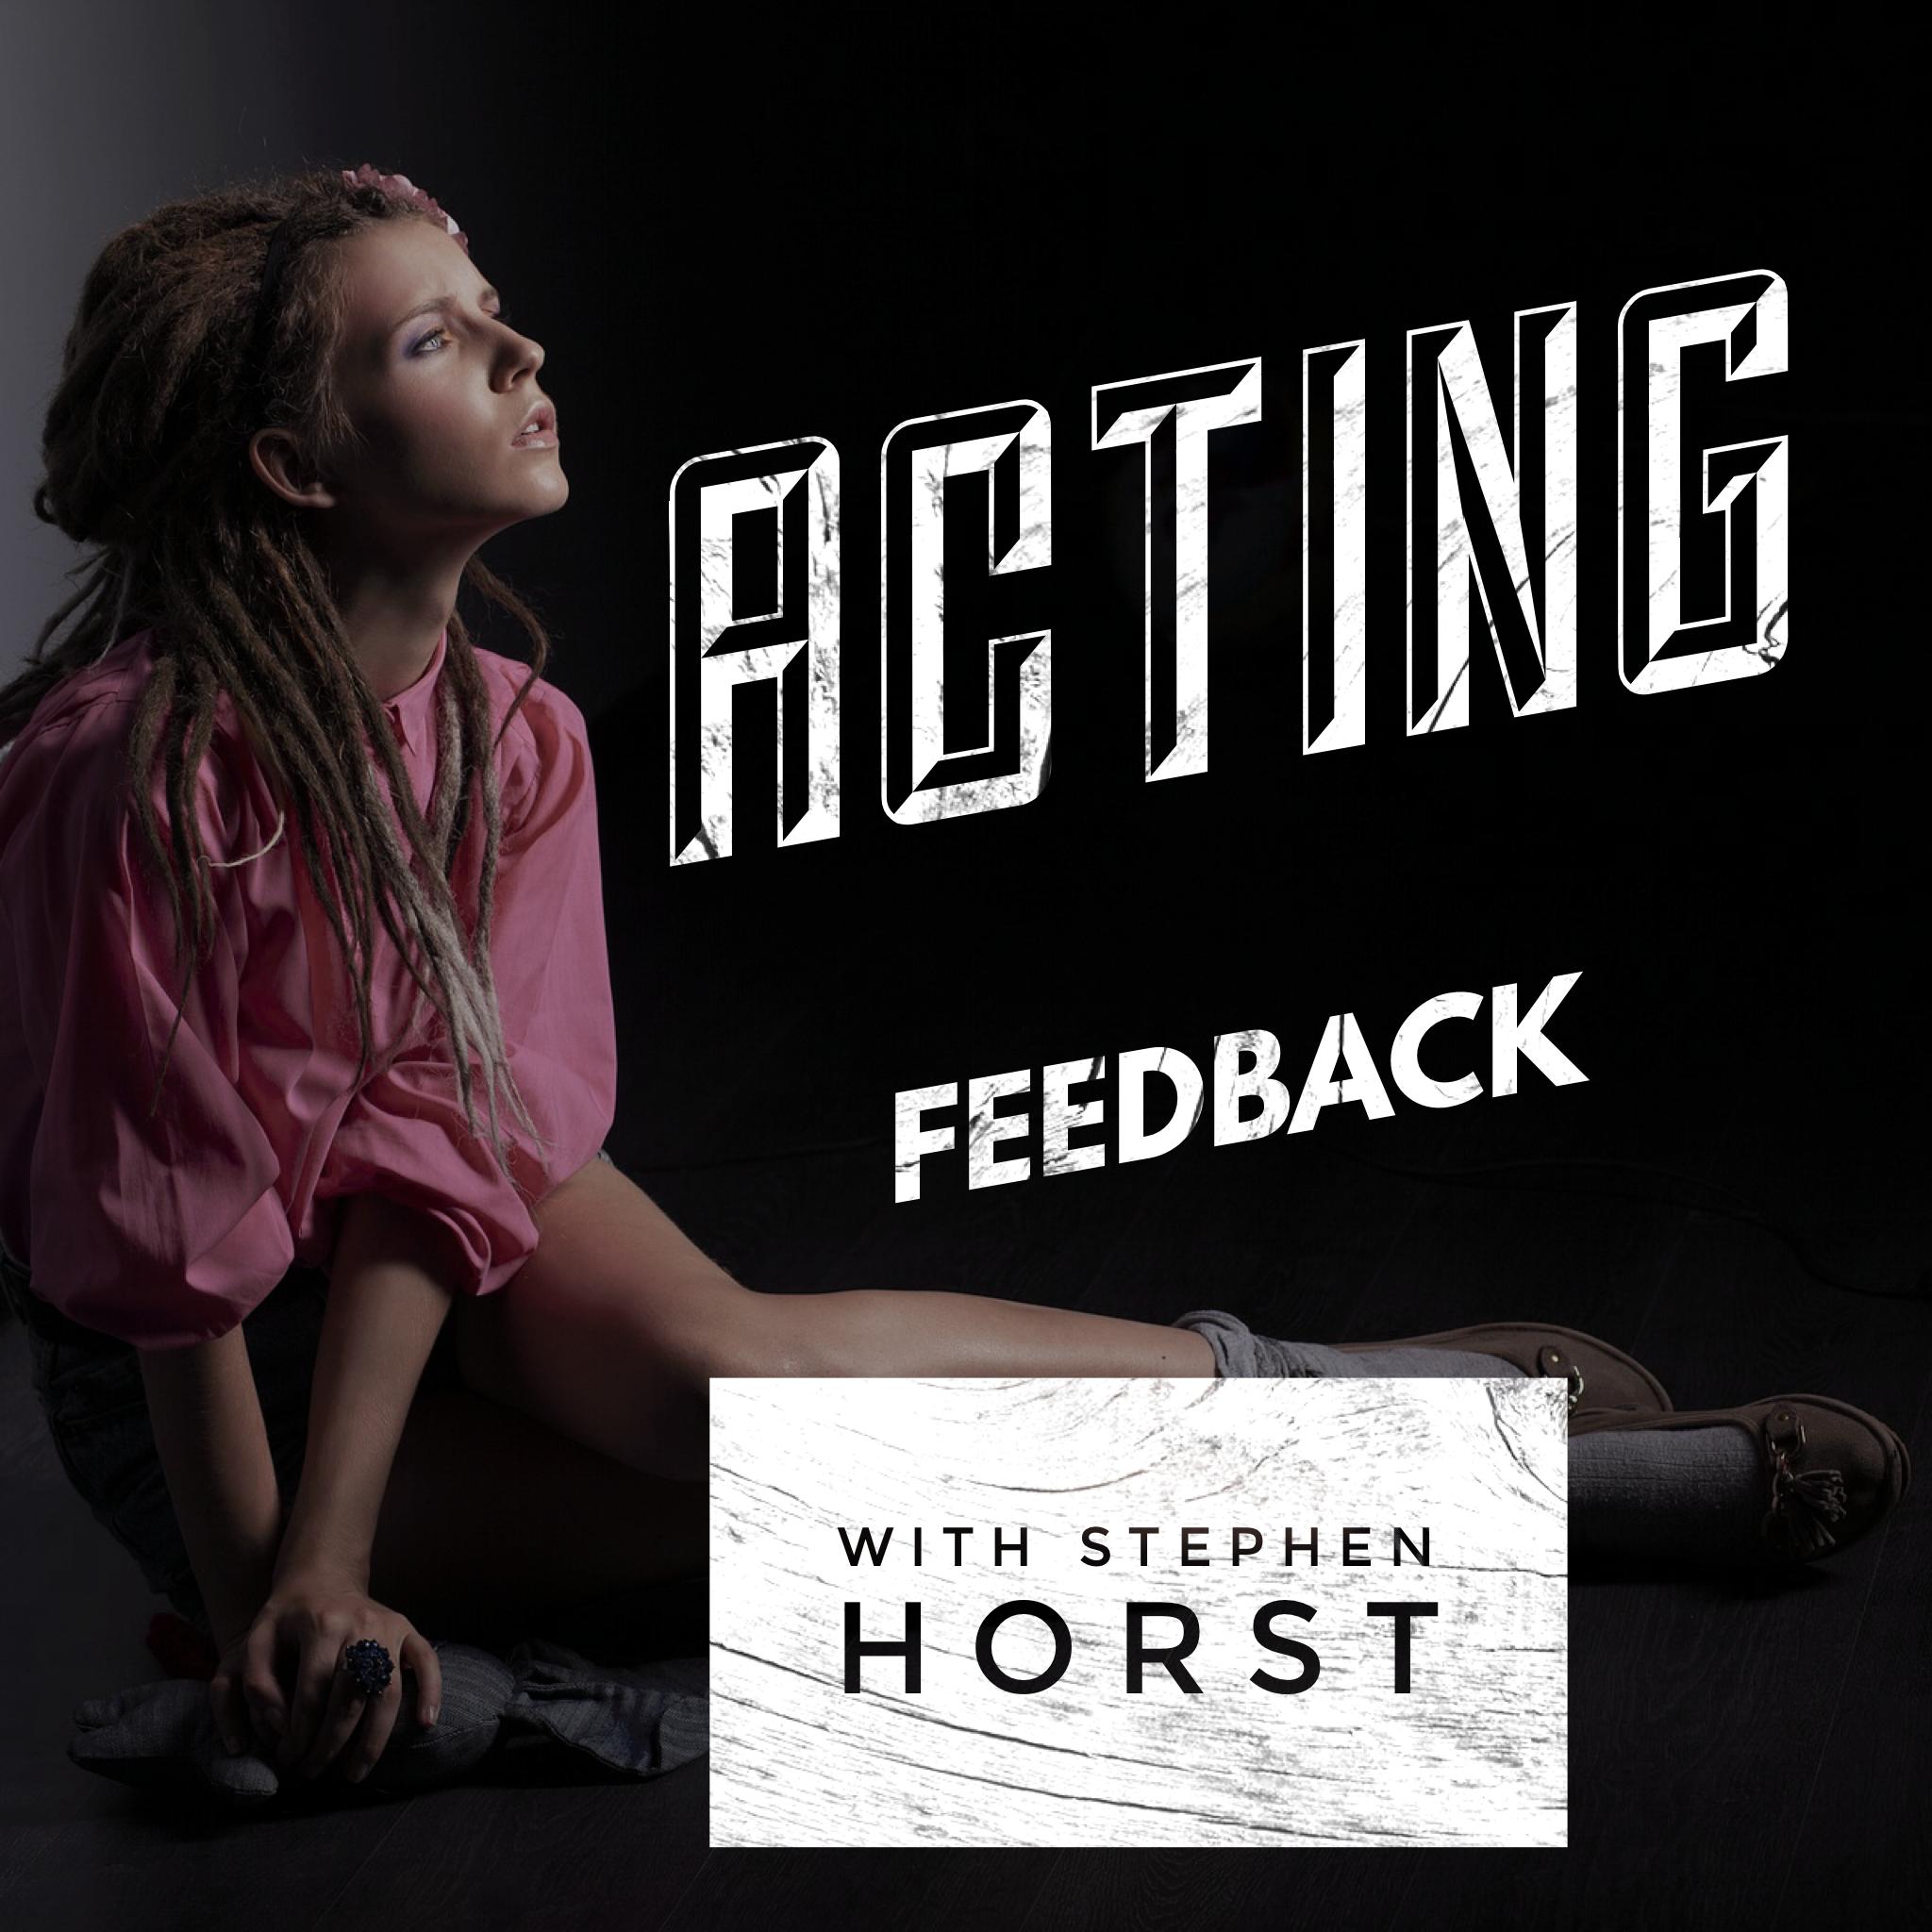 Acting Feedback Image.PNG